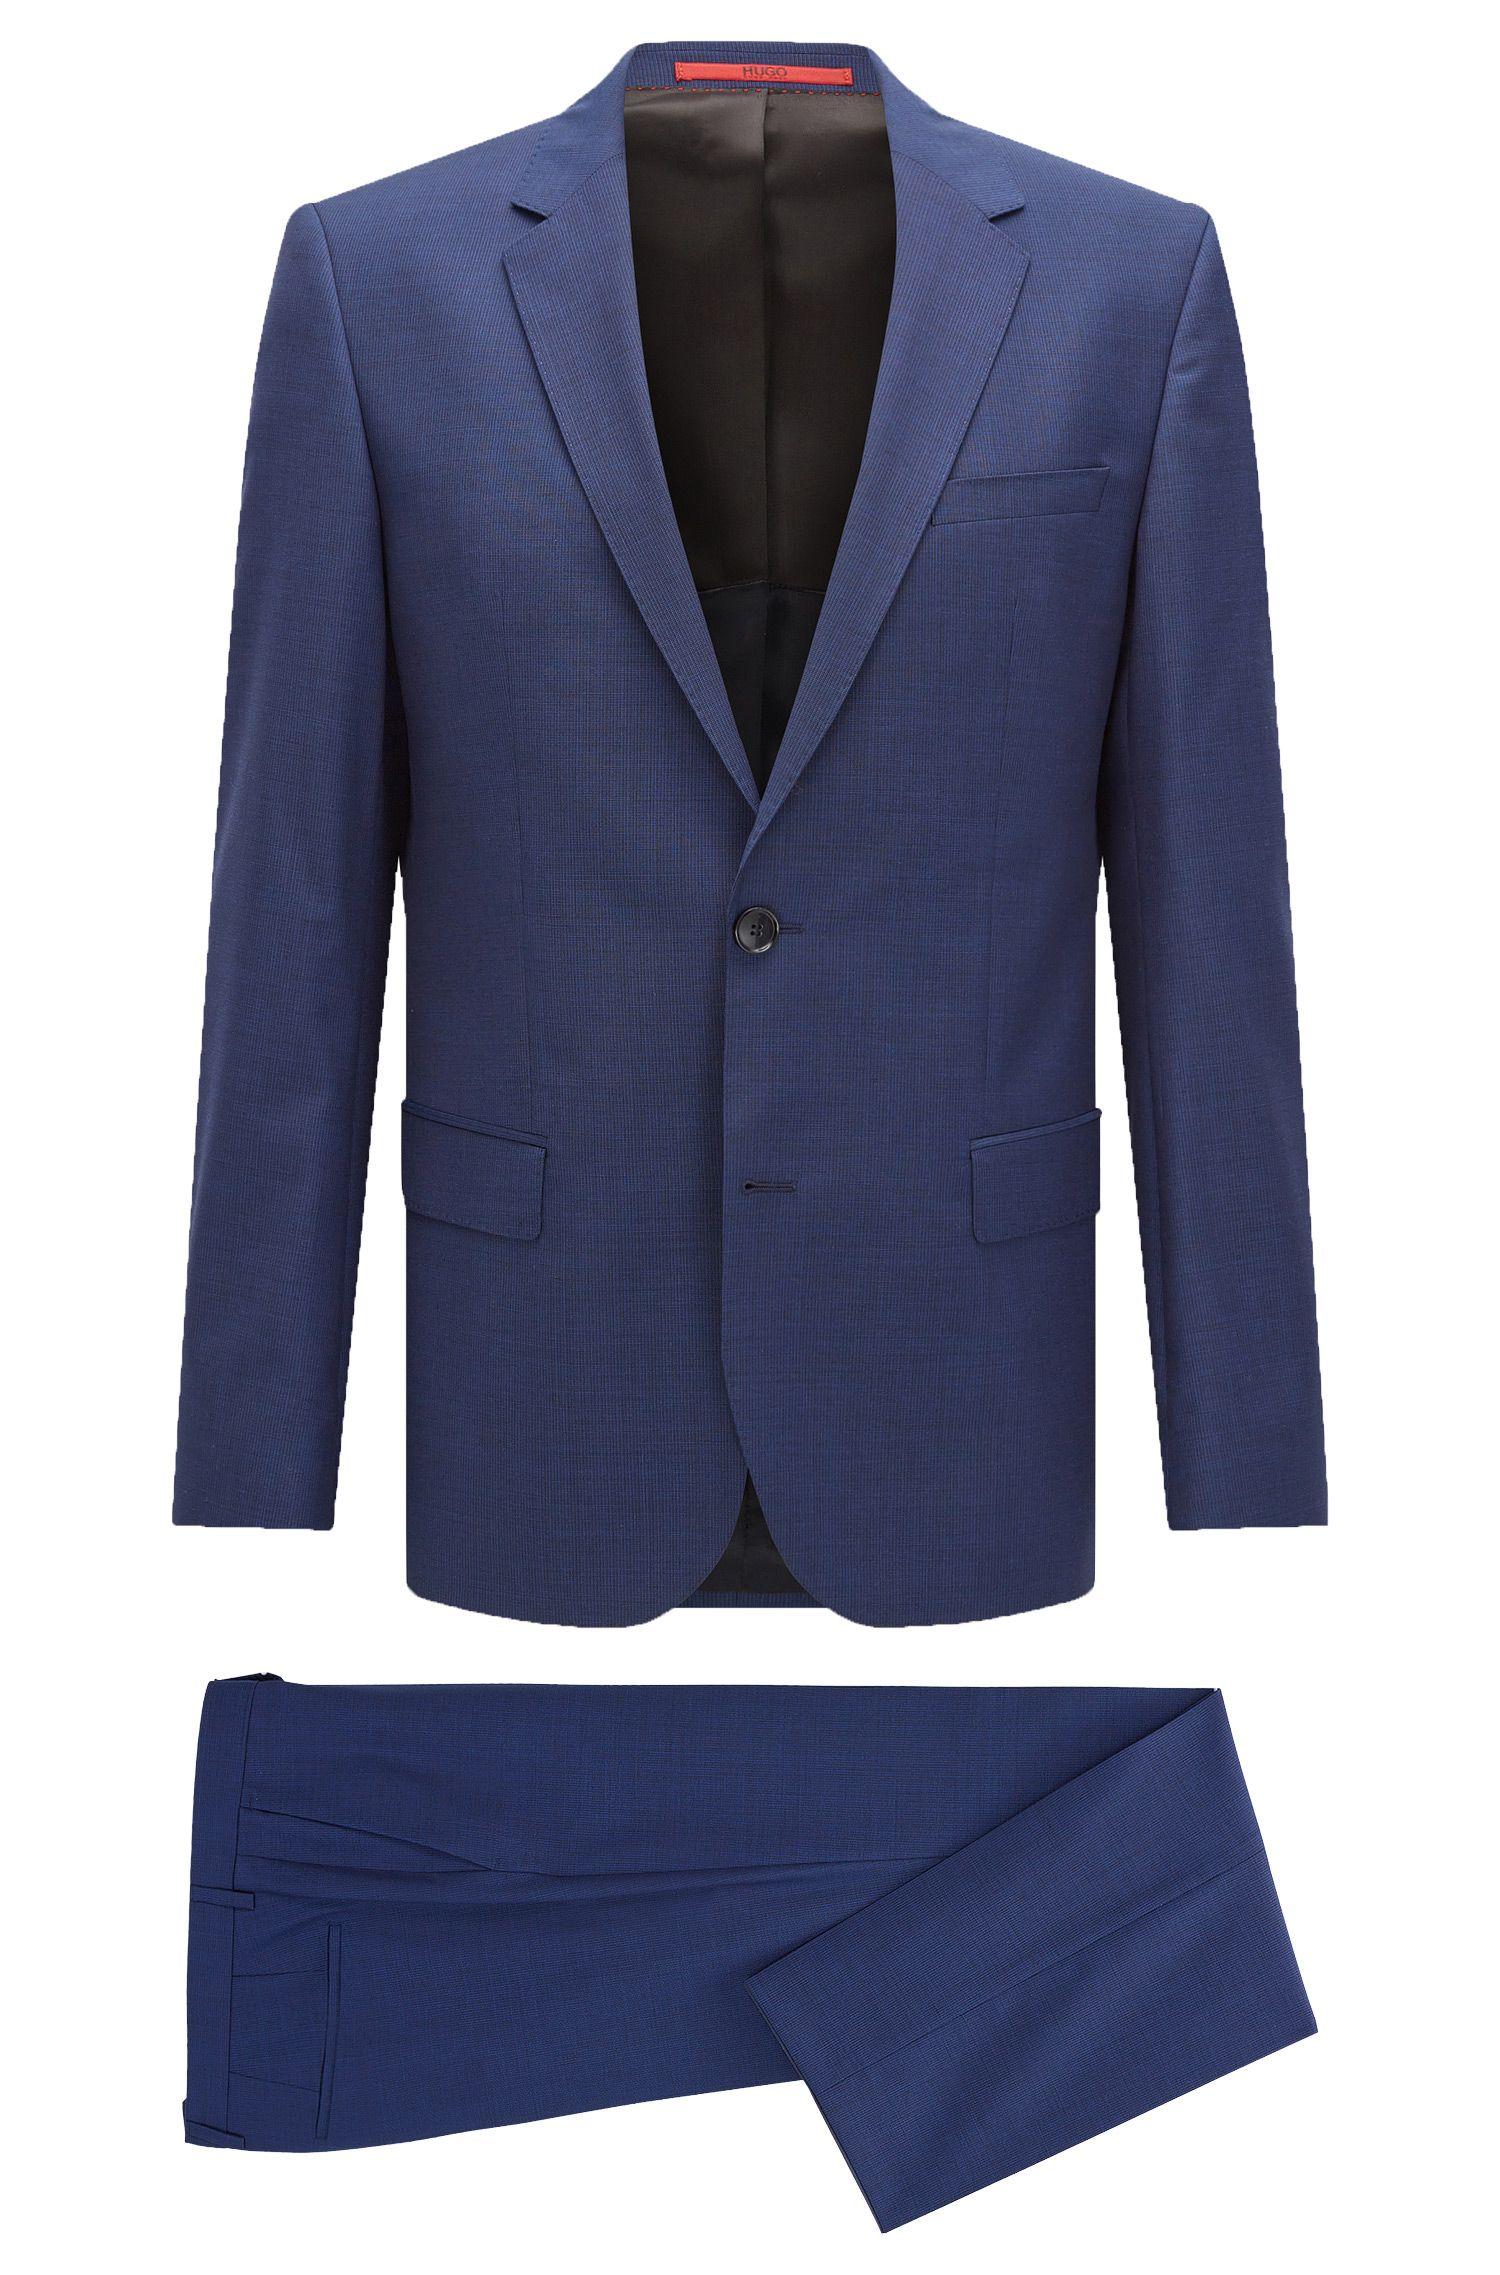 'C-Huge/C-Genius'   Slim Fit, Nailhead Italian Extra-Fine Virgin Wool Suit